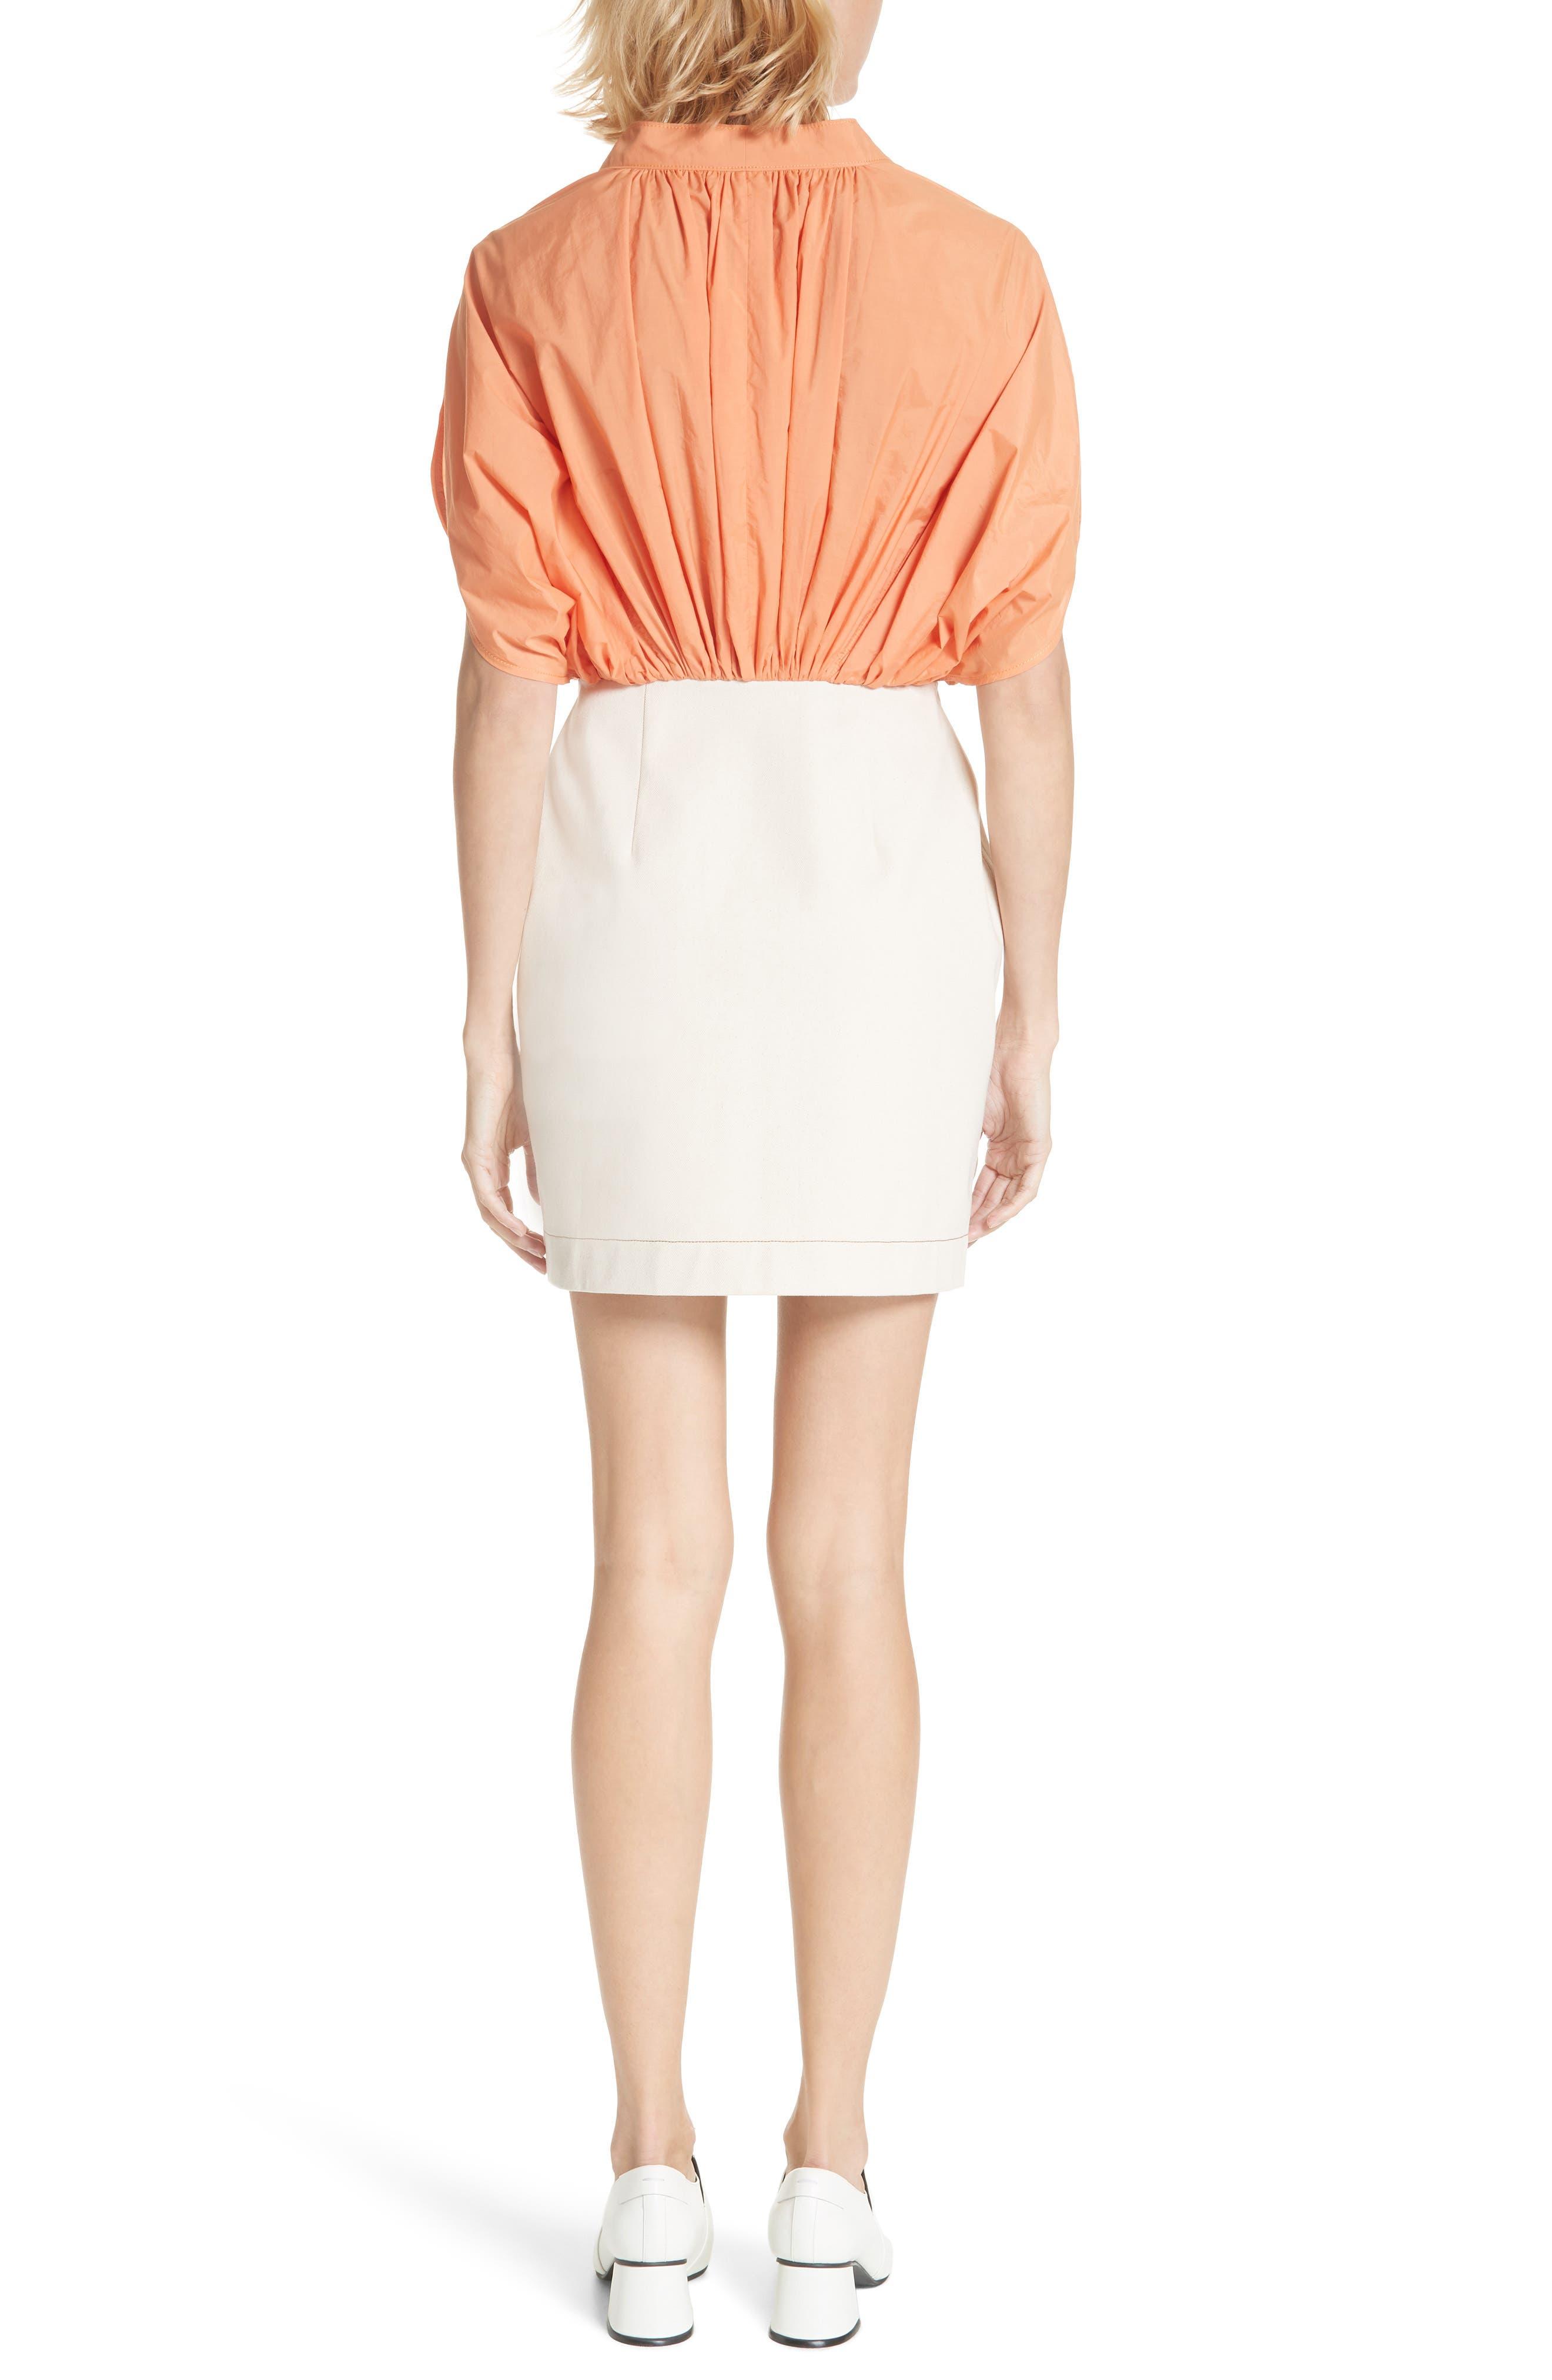 Yana Bicolor Dress,                             Alternate thumbnail 2, color,                             Cotton Orange/ Denim Ecru